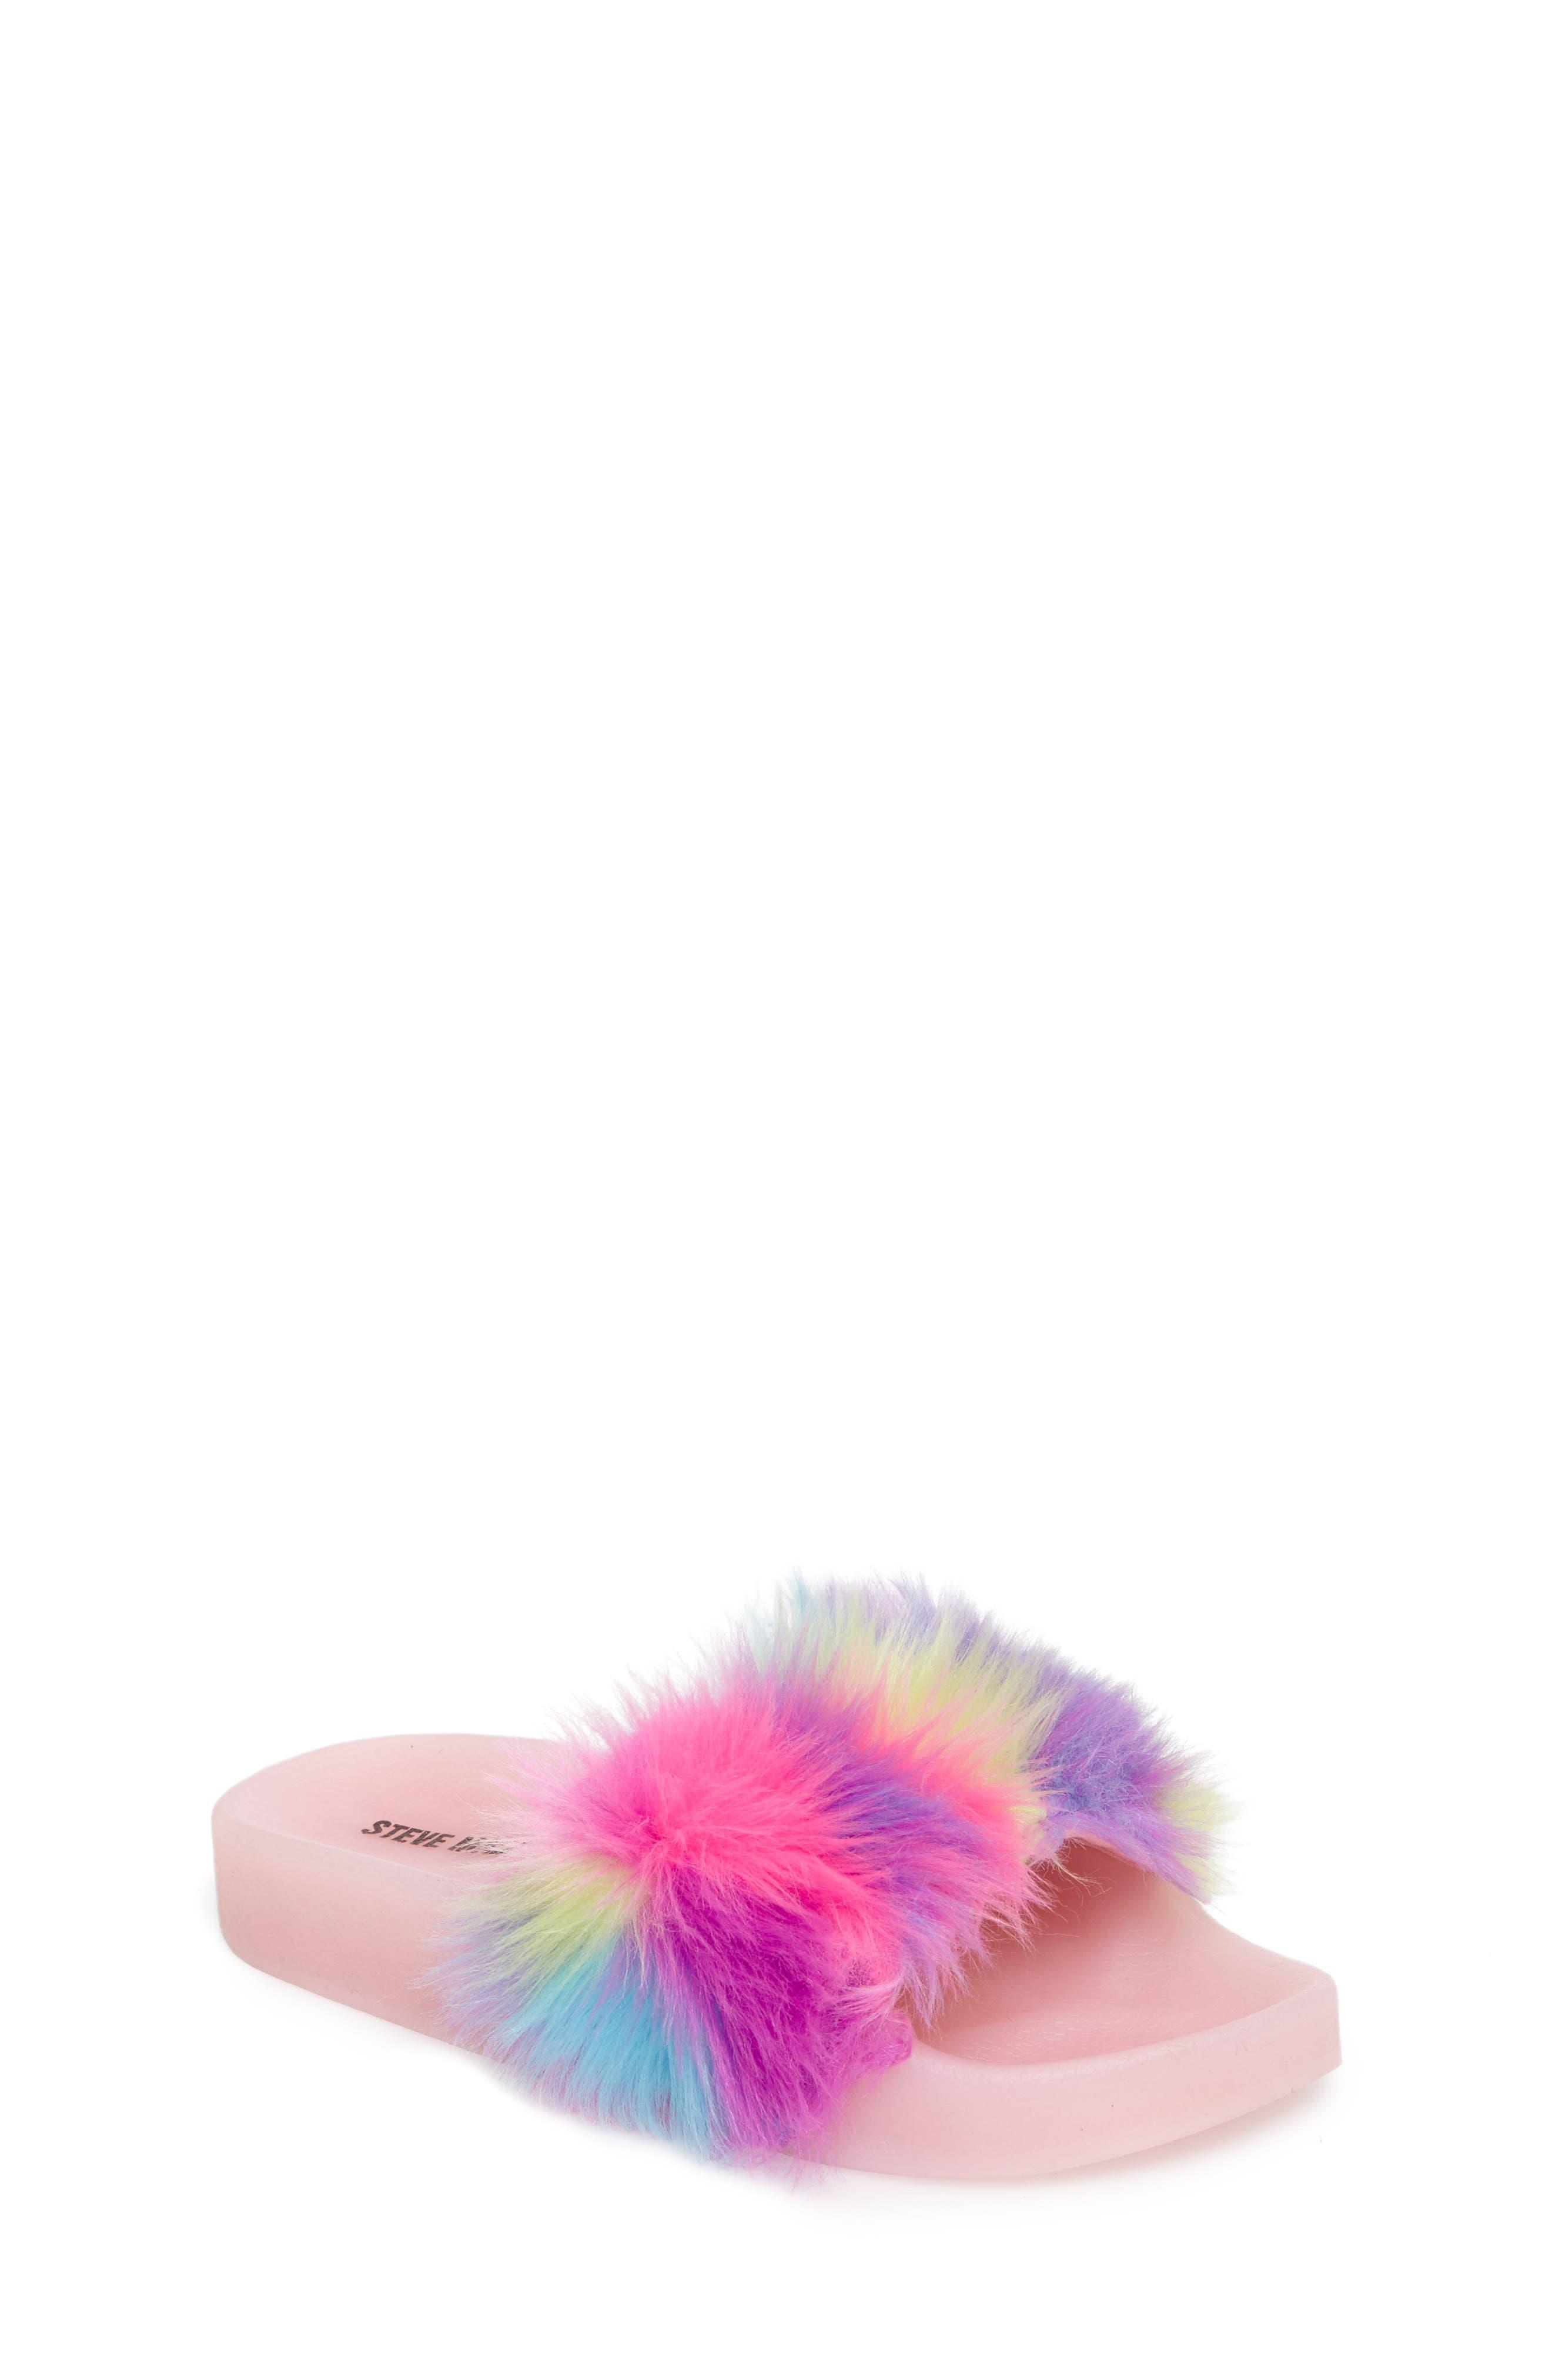 Jlights Faux Fur Light-Up Slide Sandal,                             Main thumbnail 1, color,                             650